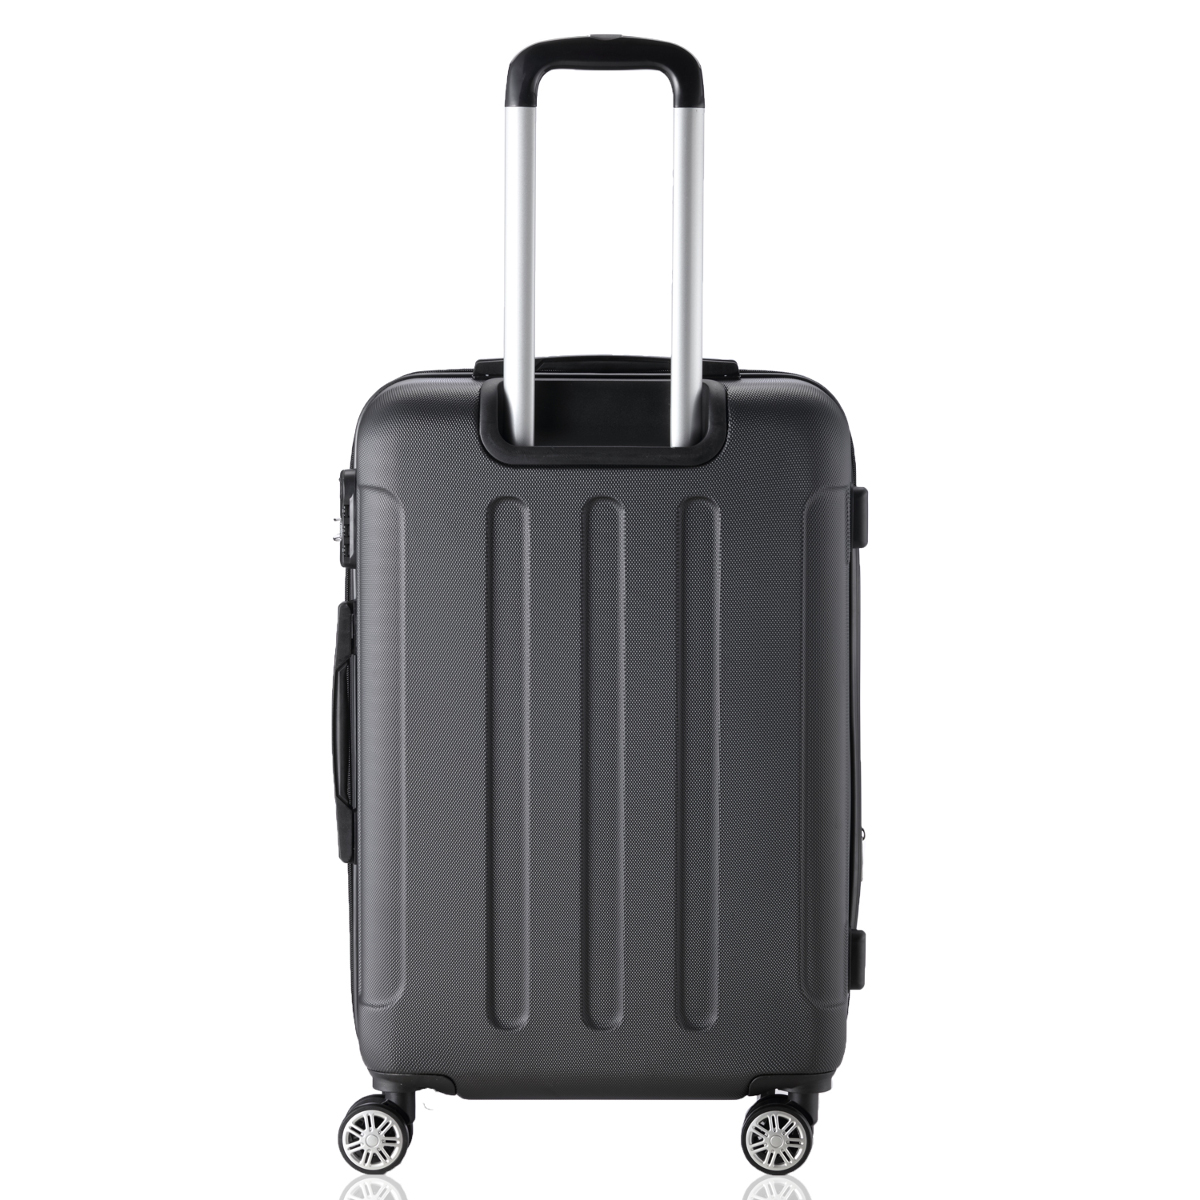 Koffer-Flexot-2045-Hartschalenkoffer-Trolley-Kofferset-Reisekoffer-M-L-XL-Set Indexbild 36